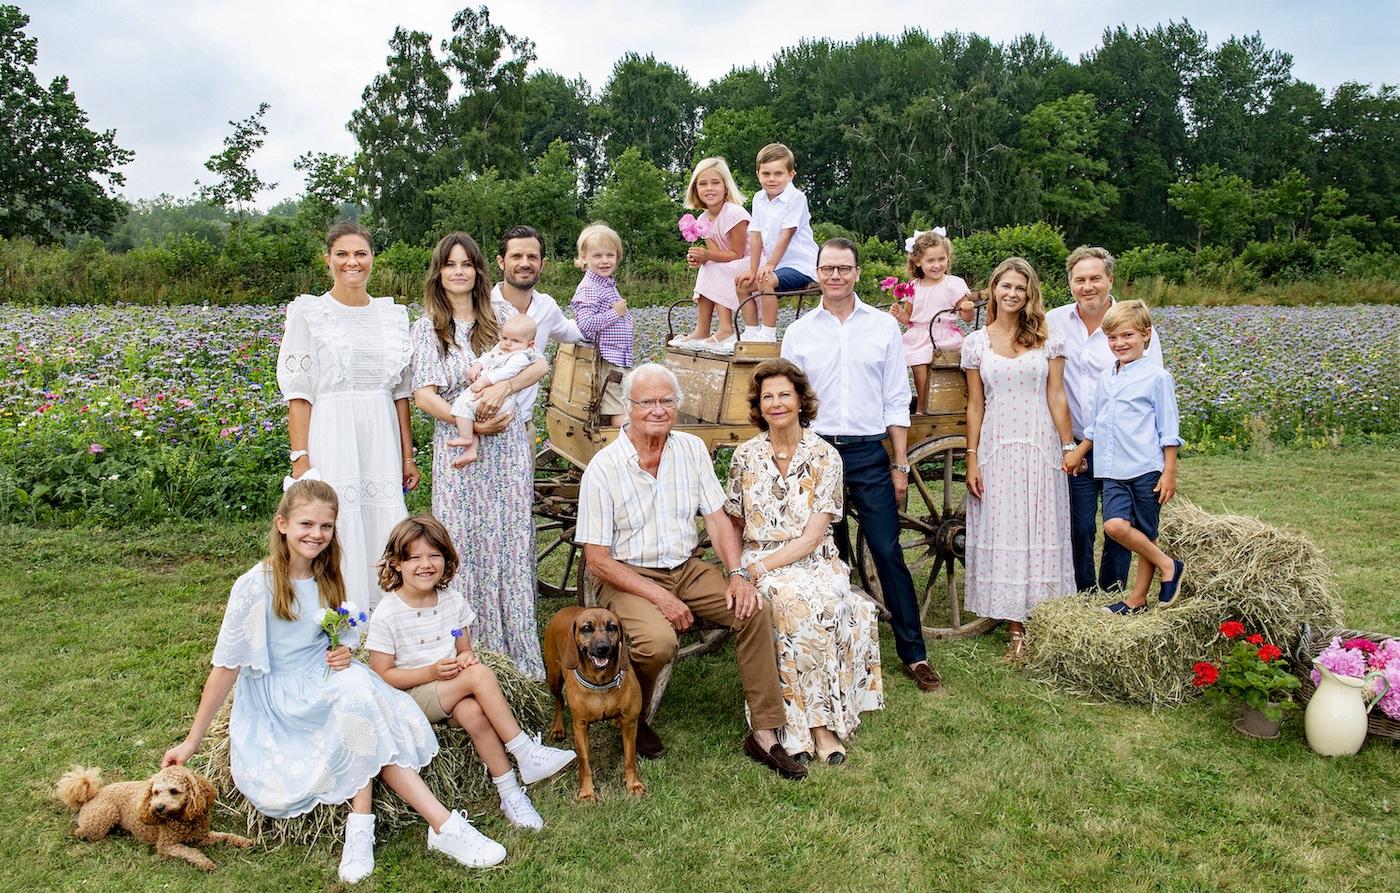 Schwedische Royals neues Familienfoto